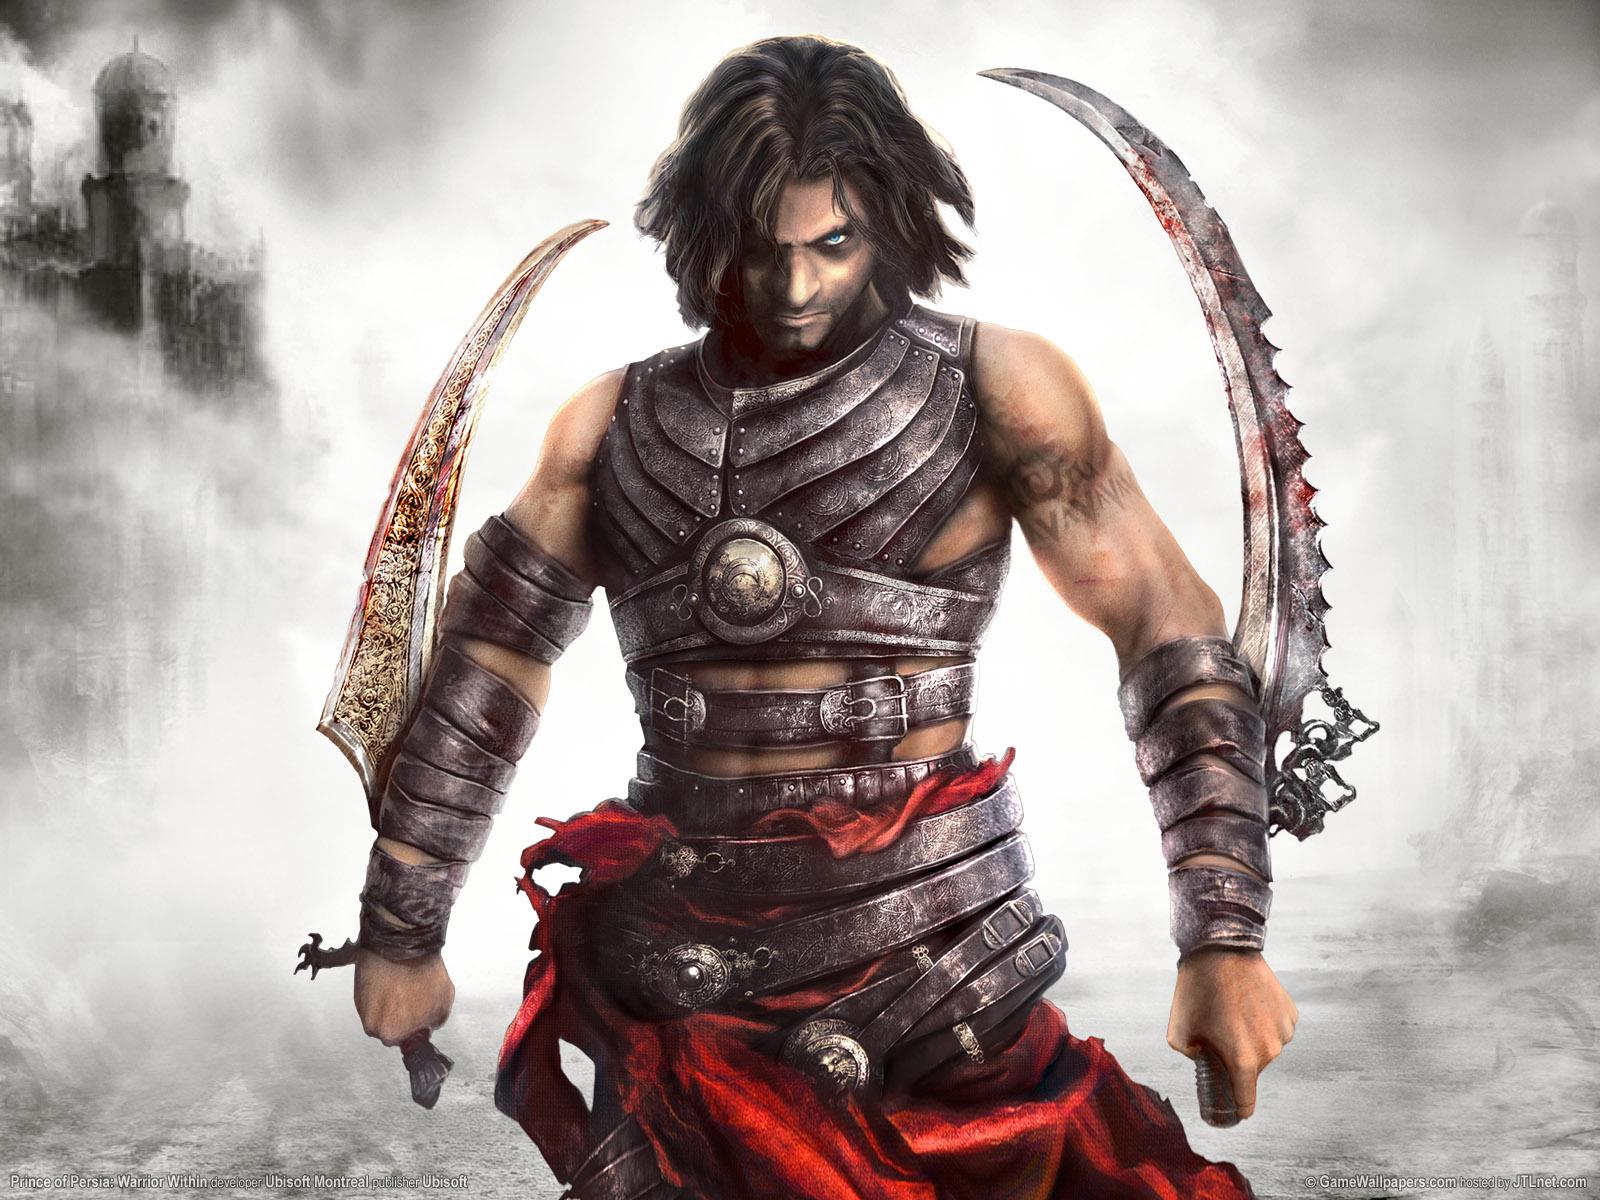 Prince of Persia Trilogy + HD + 3d + exclusividad para europa = EPIC FAIL!